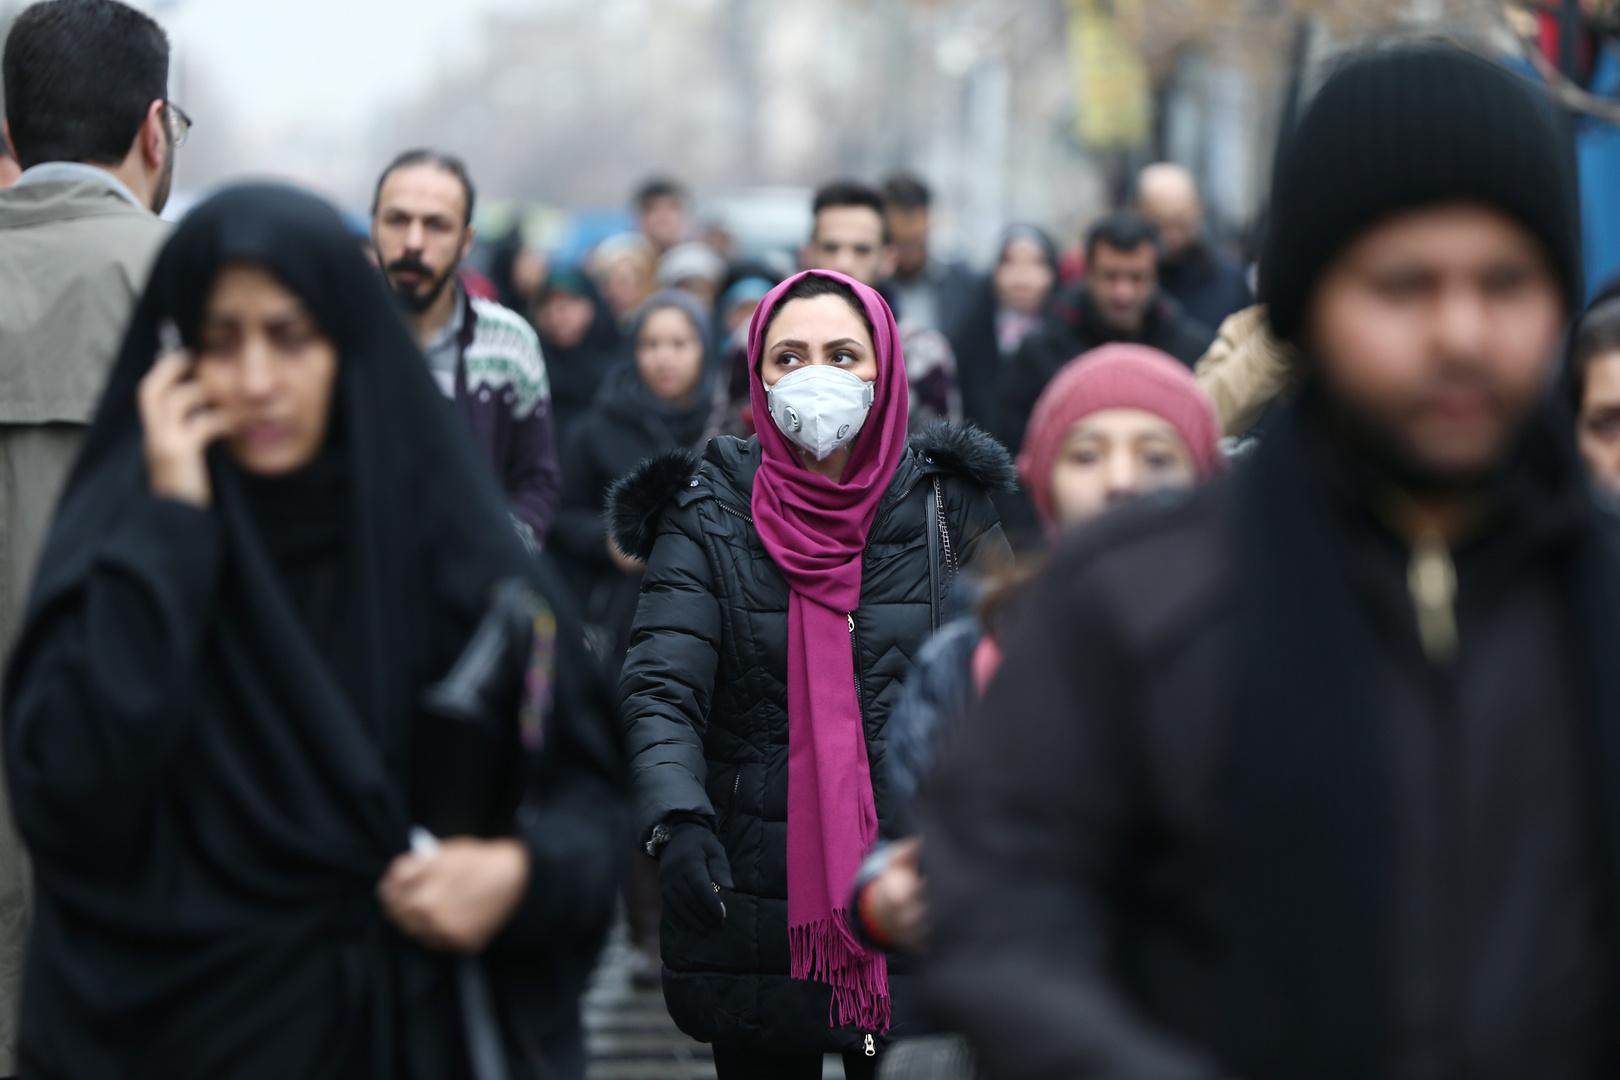 إيران تكشف عن مصدر انتشار